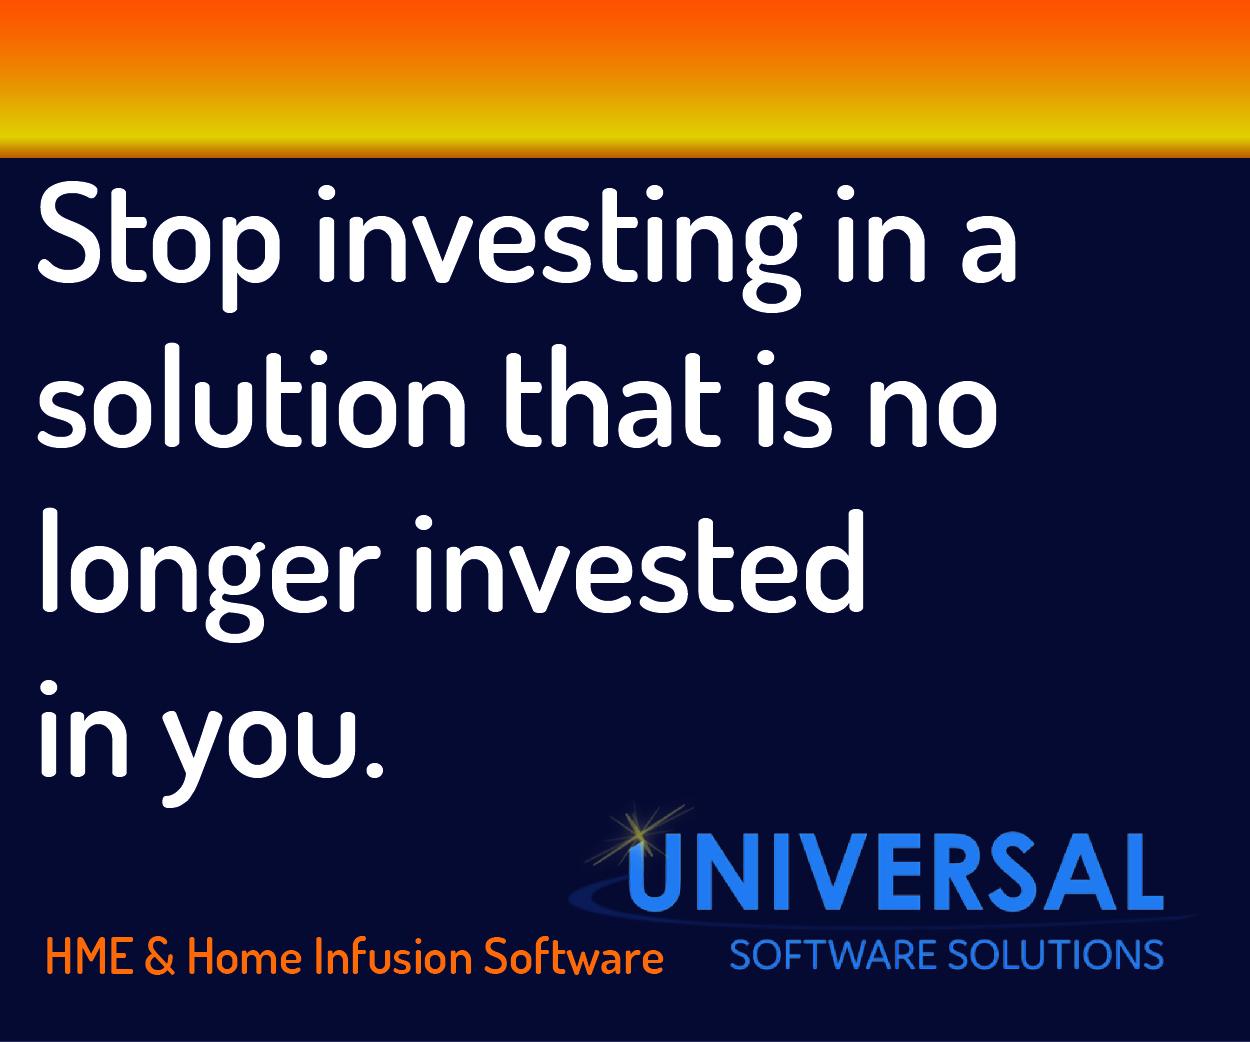 Universal Software